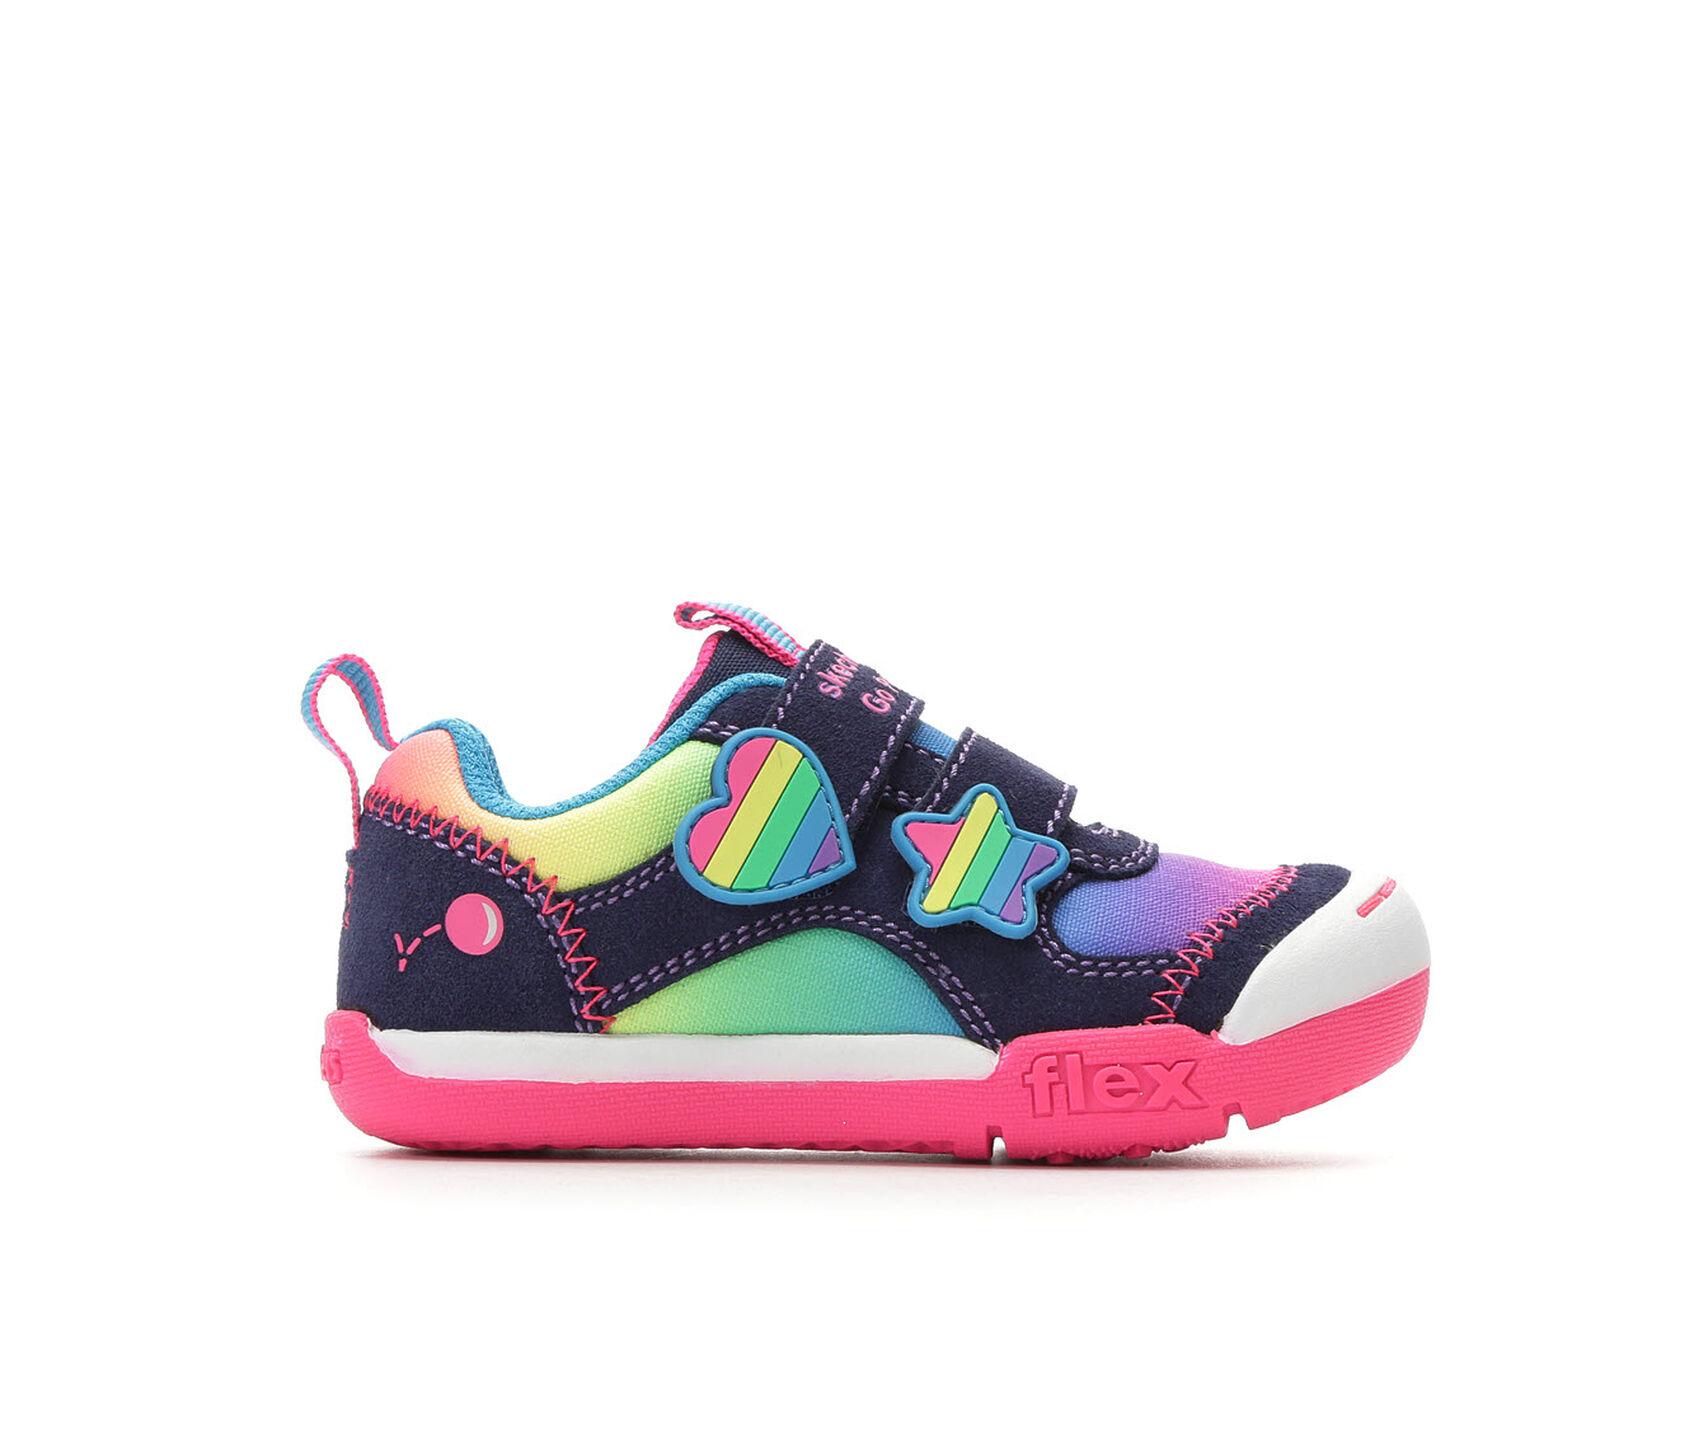 91af3e1b0f019 Girls' Skechers Toddler & Little Kid Flex Play Sneakers | Shoe Carnival